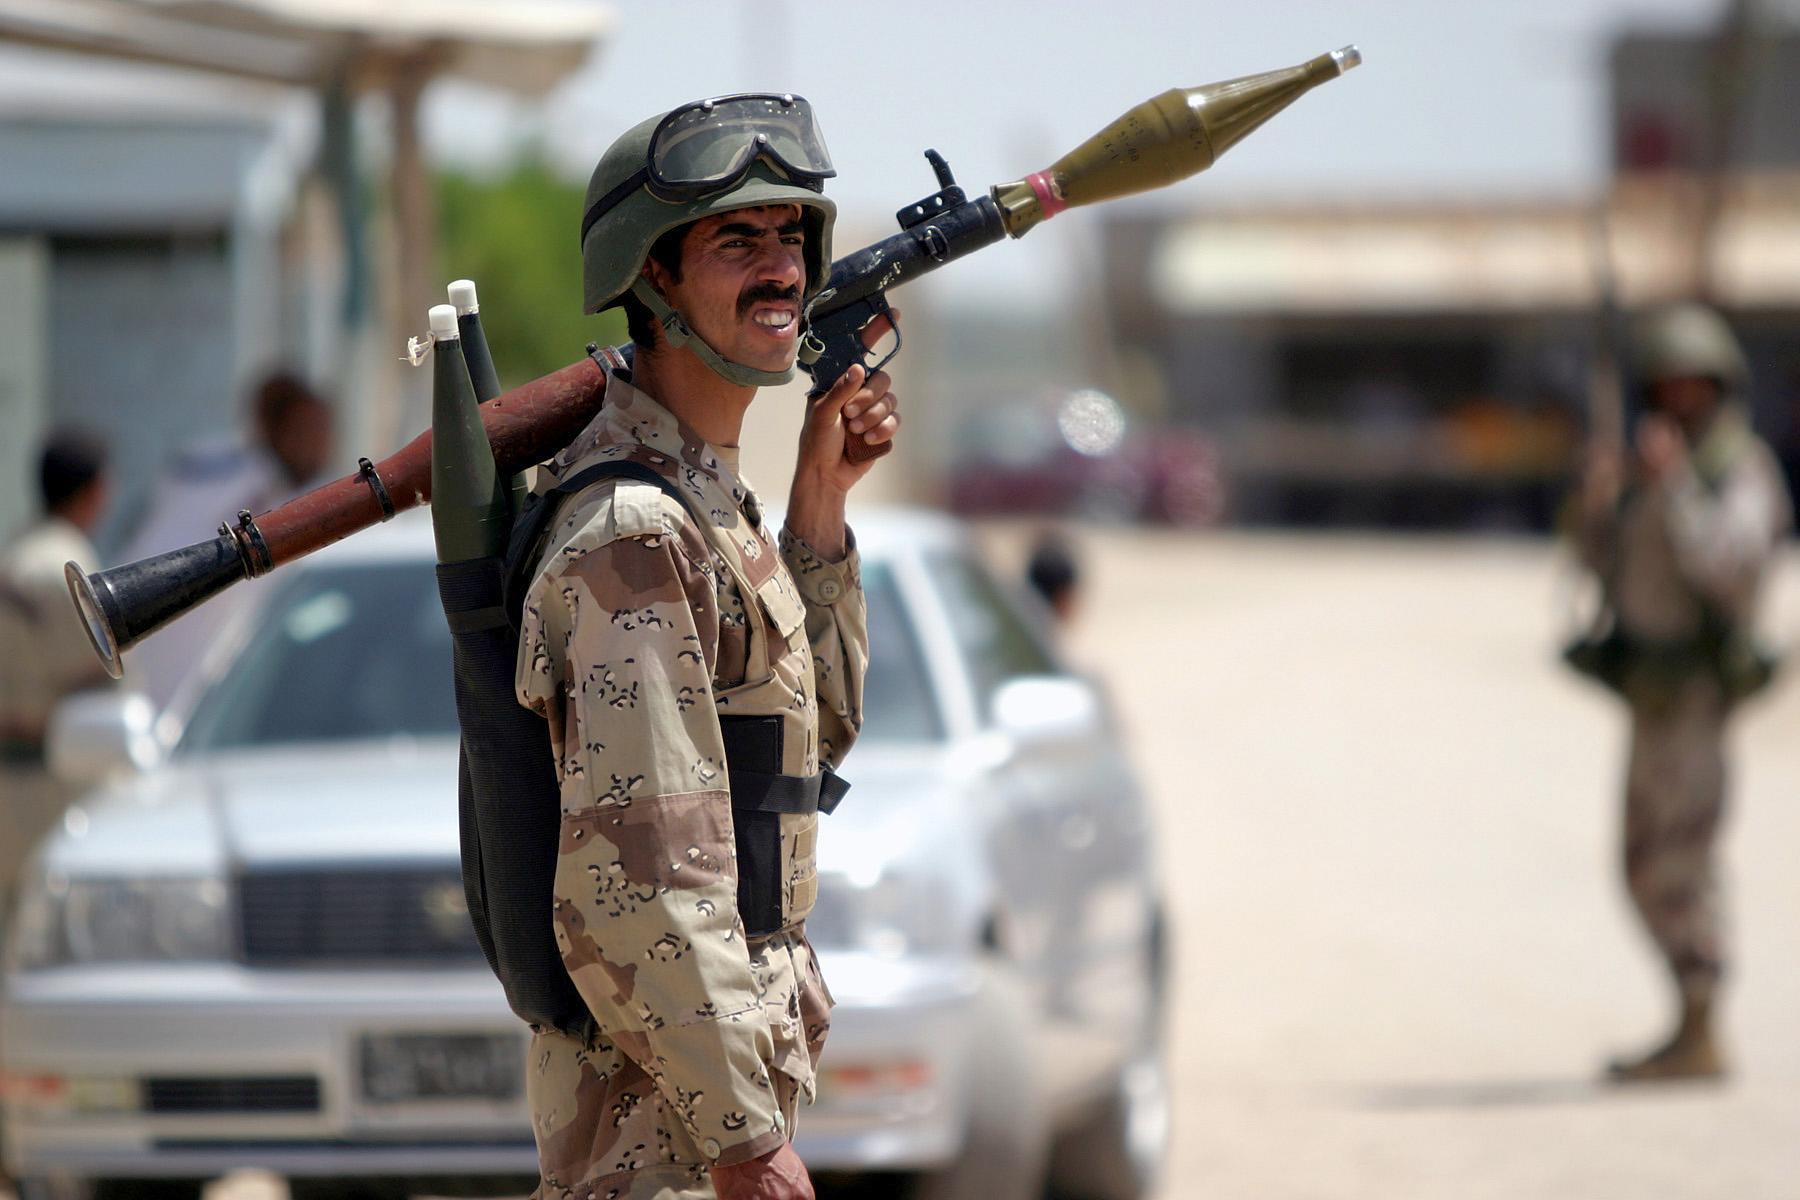 RPG-7 în Irak